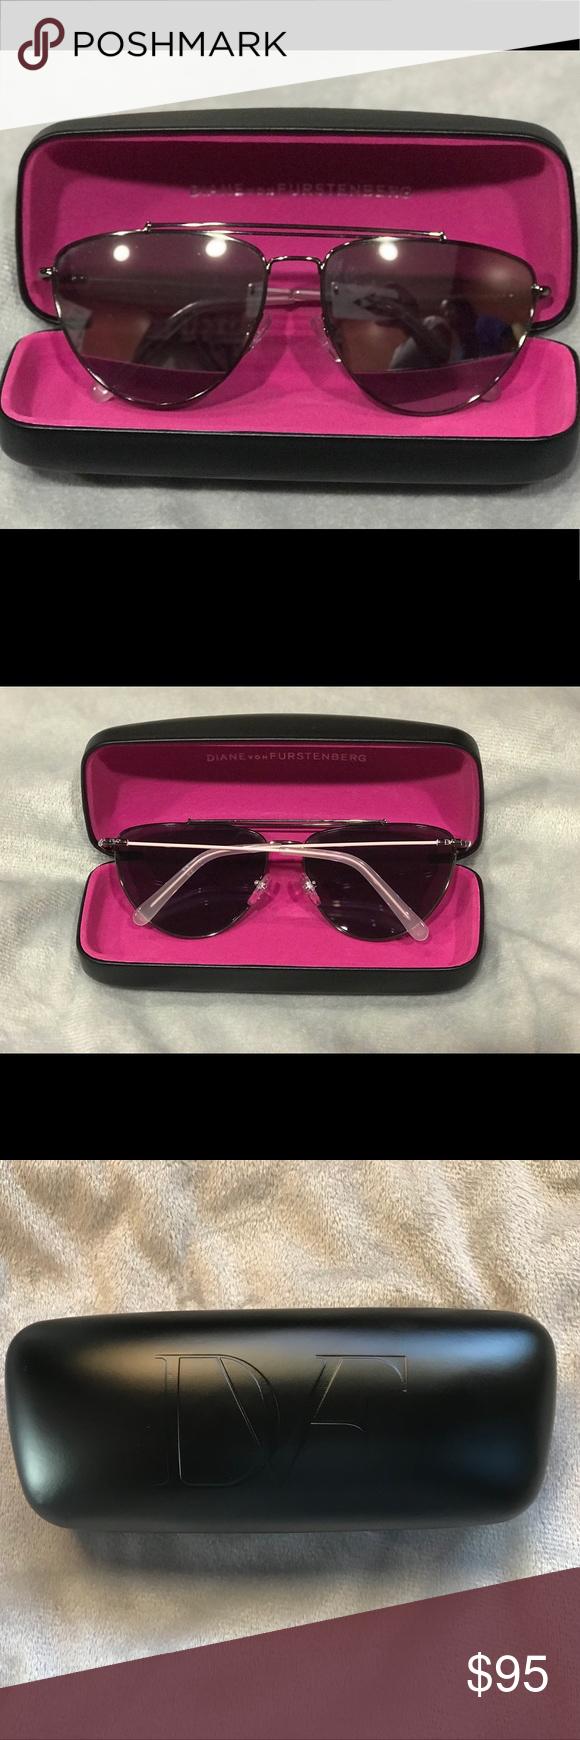 753306d0adc19 Diane Von Furstenberg Krista Aviator Sunglasses DVF122S - Chic and modern  lightweight aviator sunglass with silver